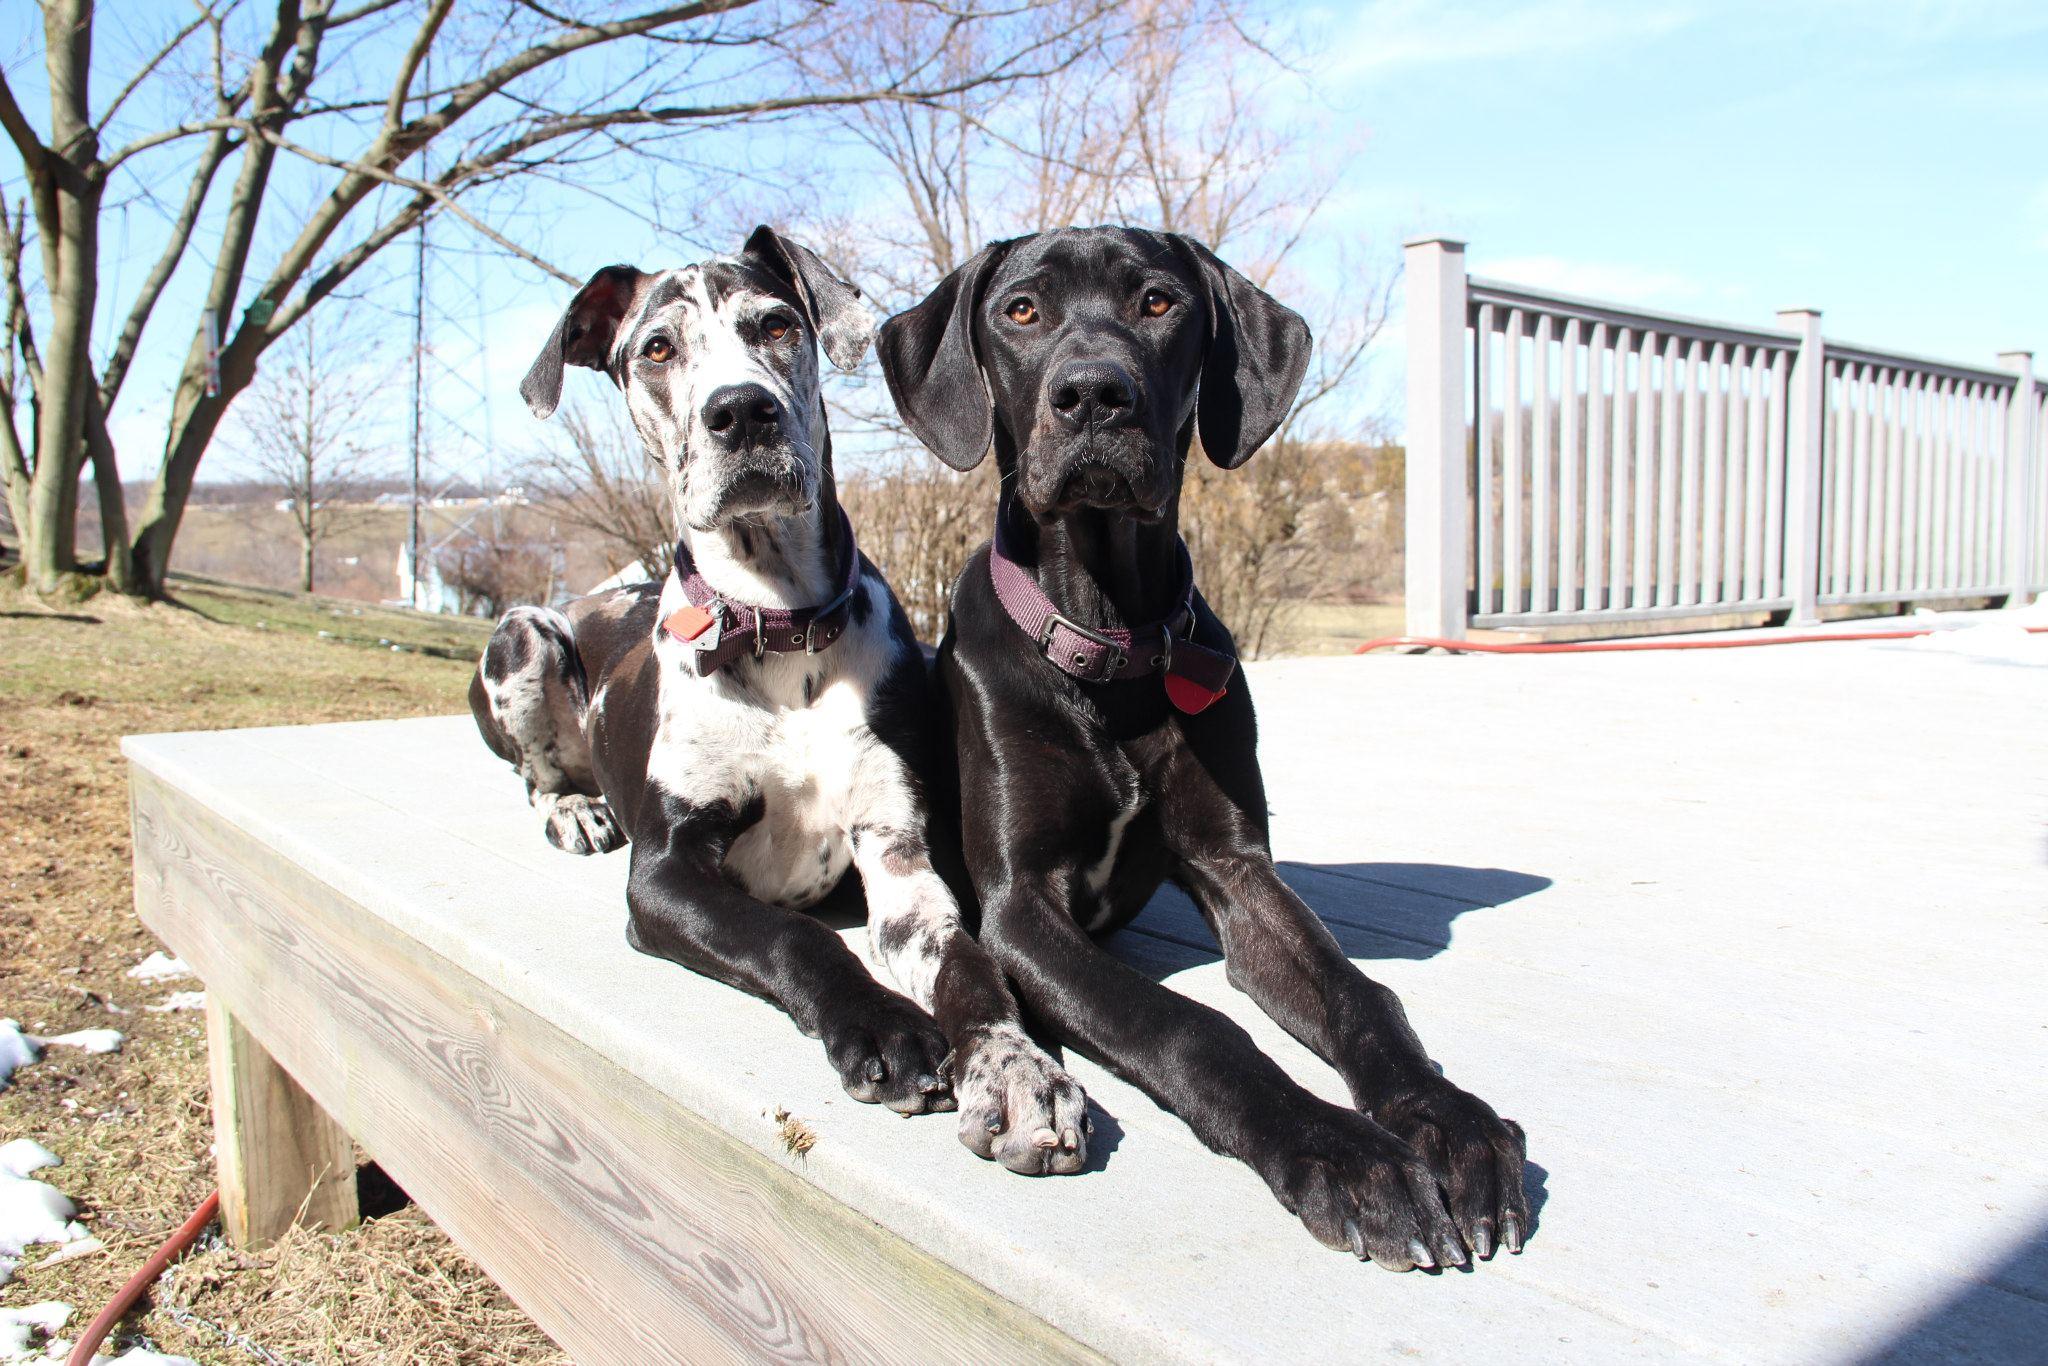 Mobile Vet Vought Veterinary Services - Derry, PA